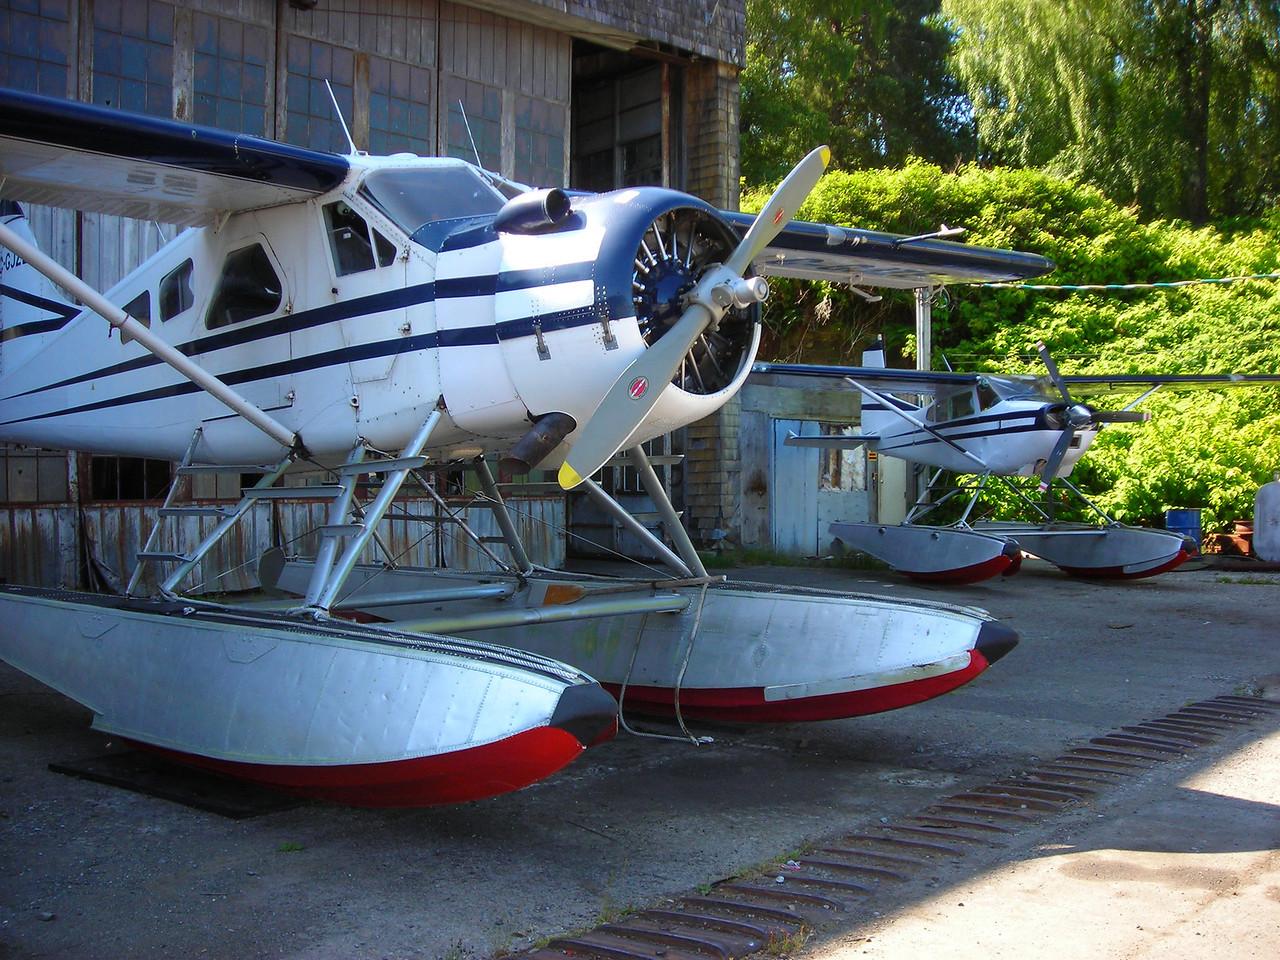 DeHavilland Beaver and Cessna float planes at Coal Harbour